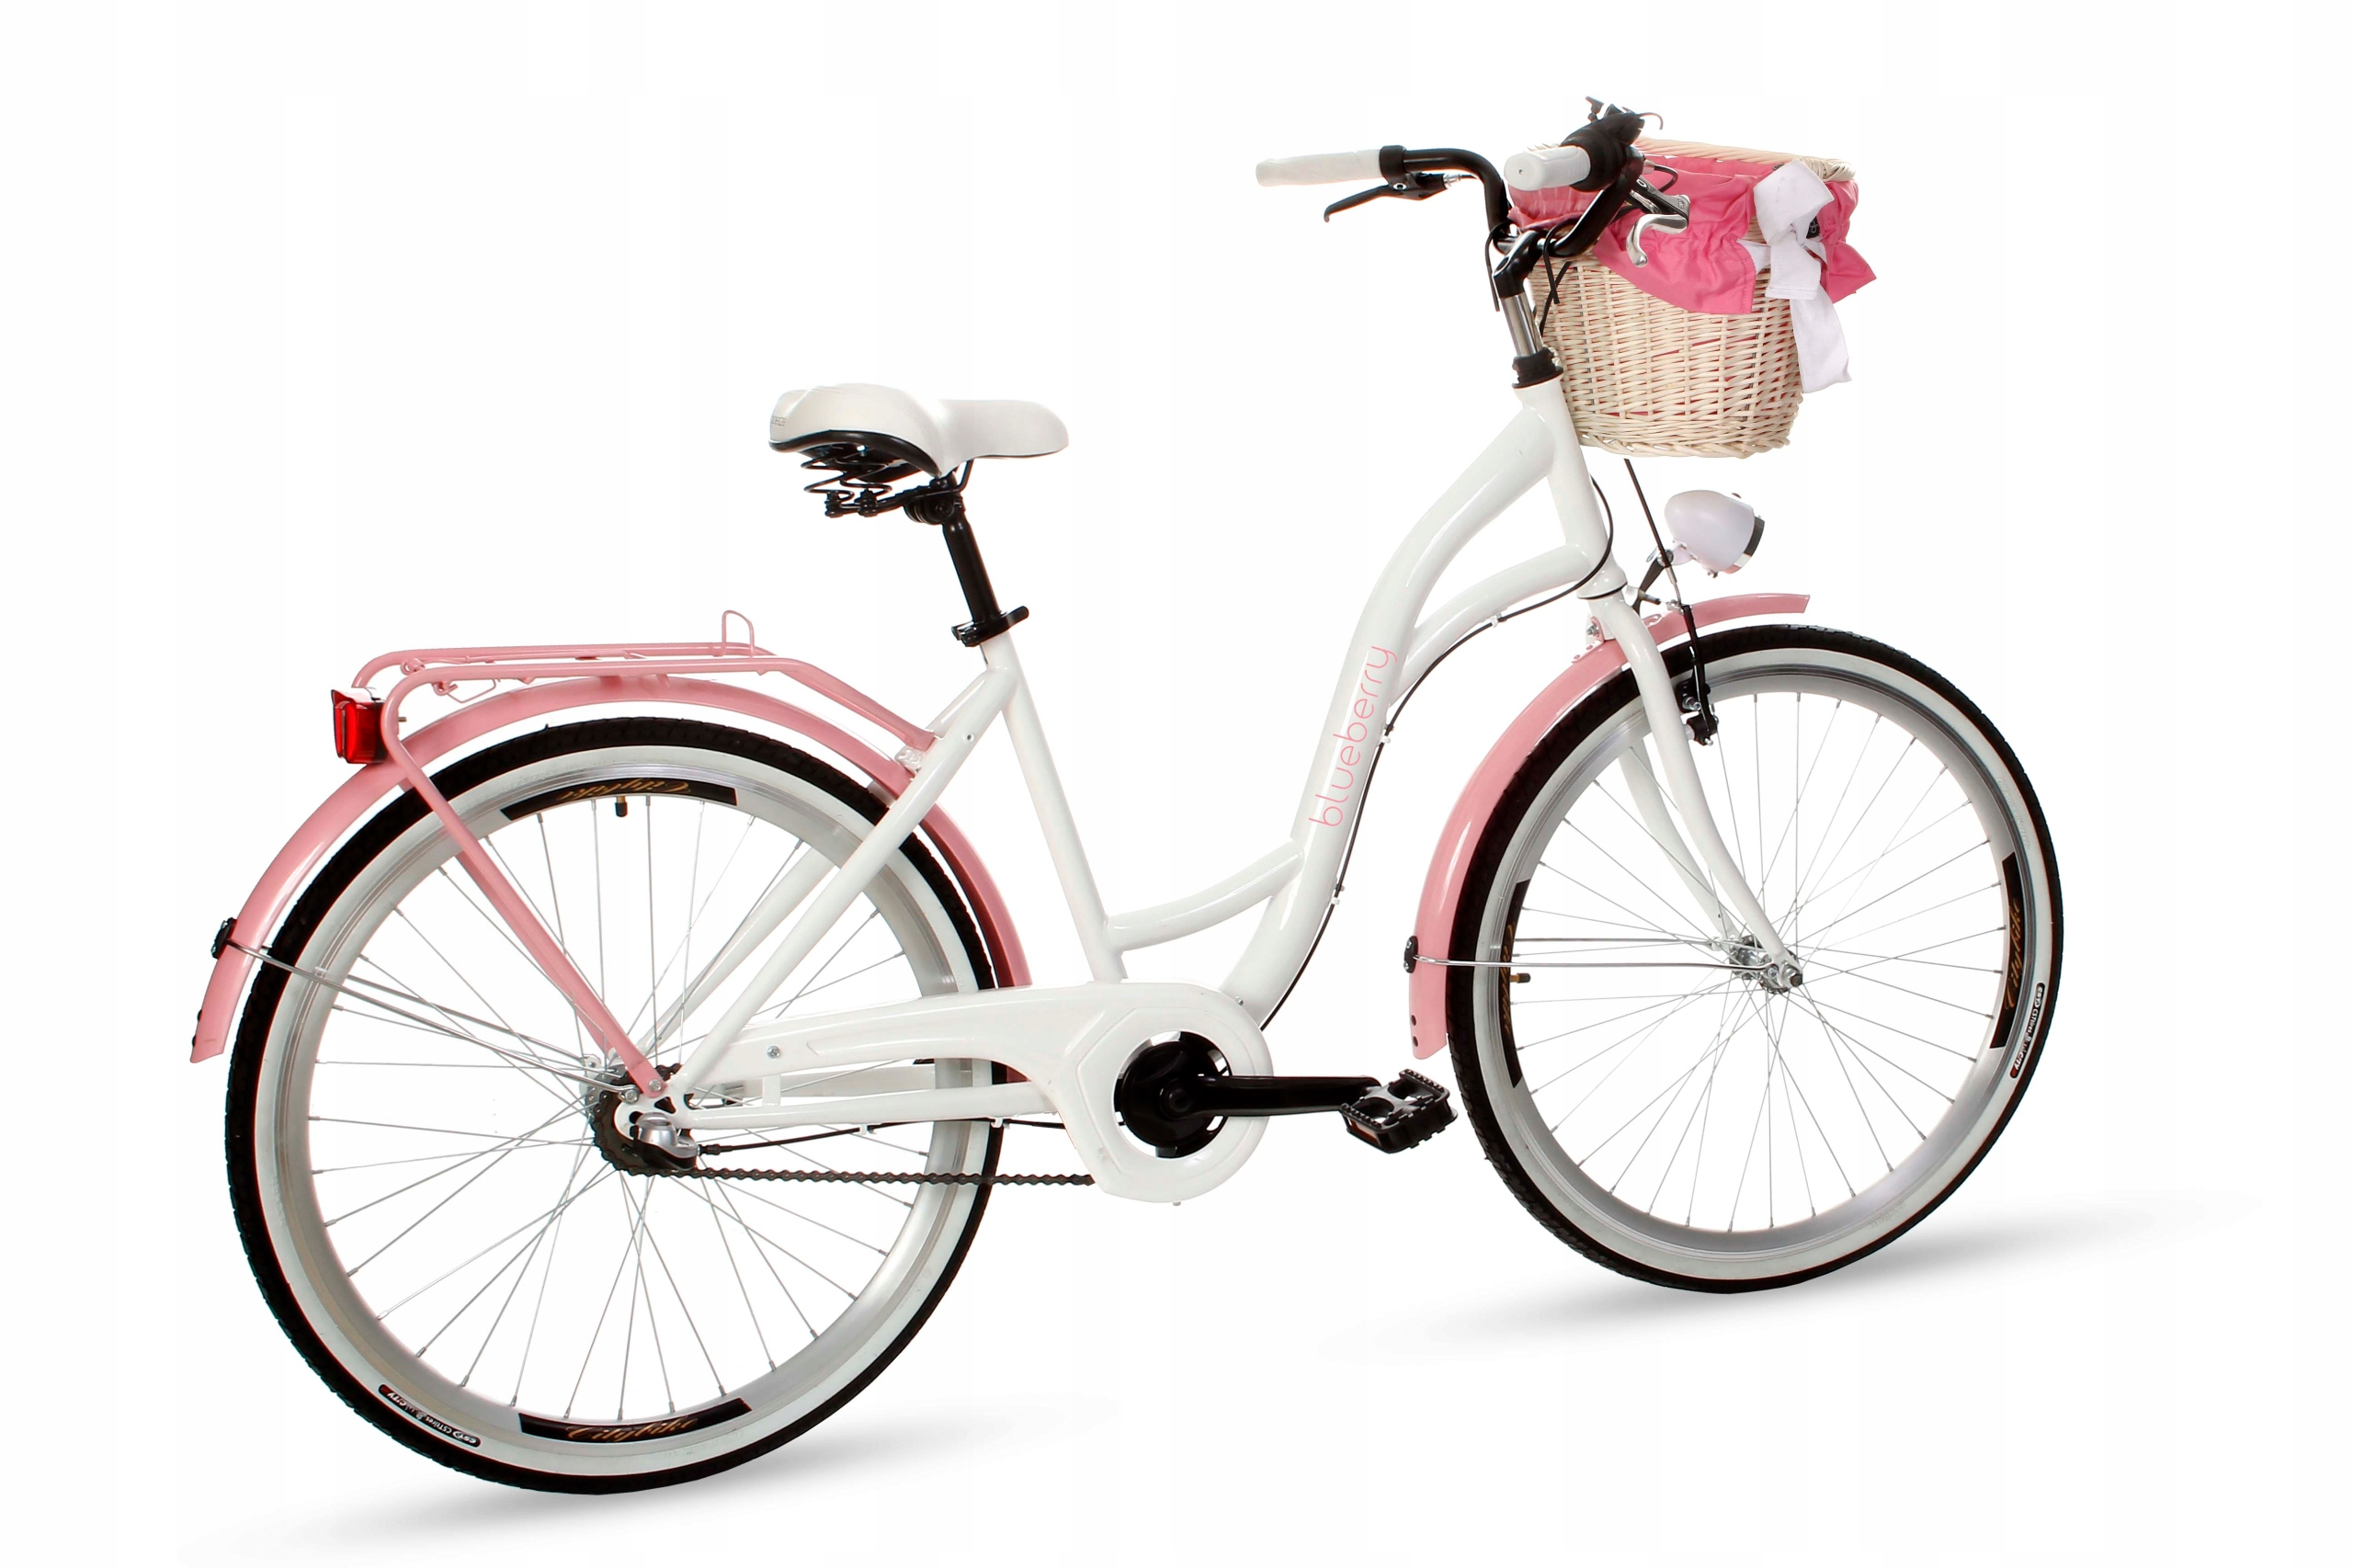 Dámsky mestský bicykel Goetze BLUEBERRY 26 3b košík!  Viacfarebná farba